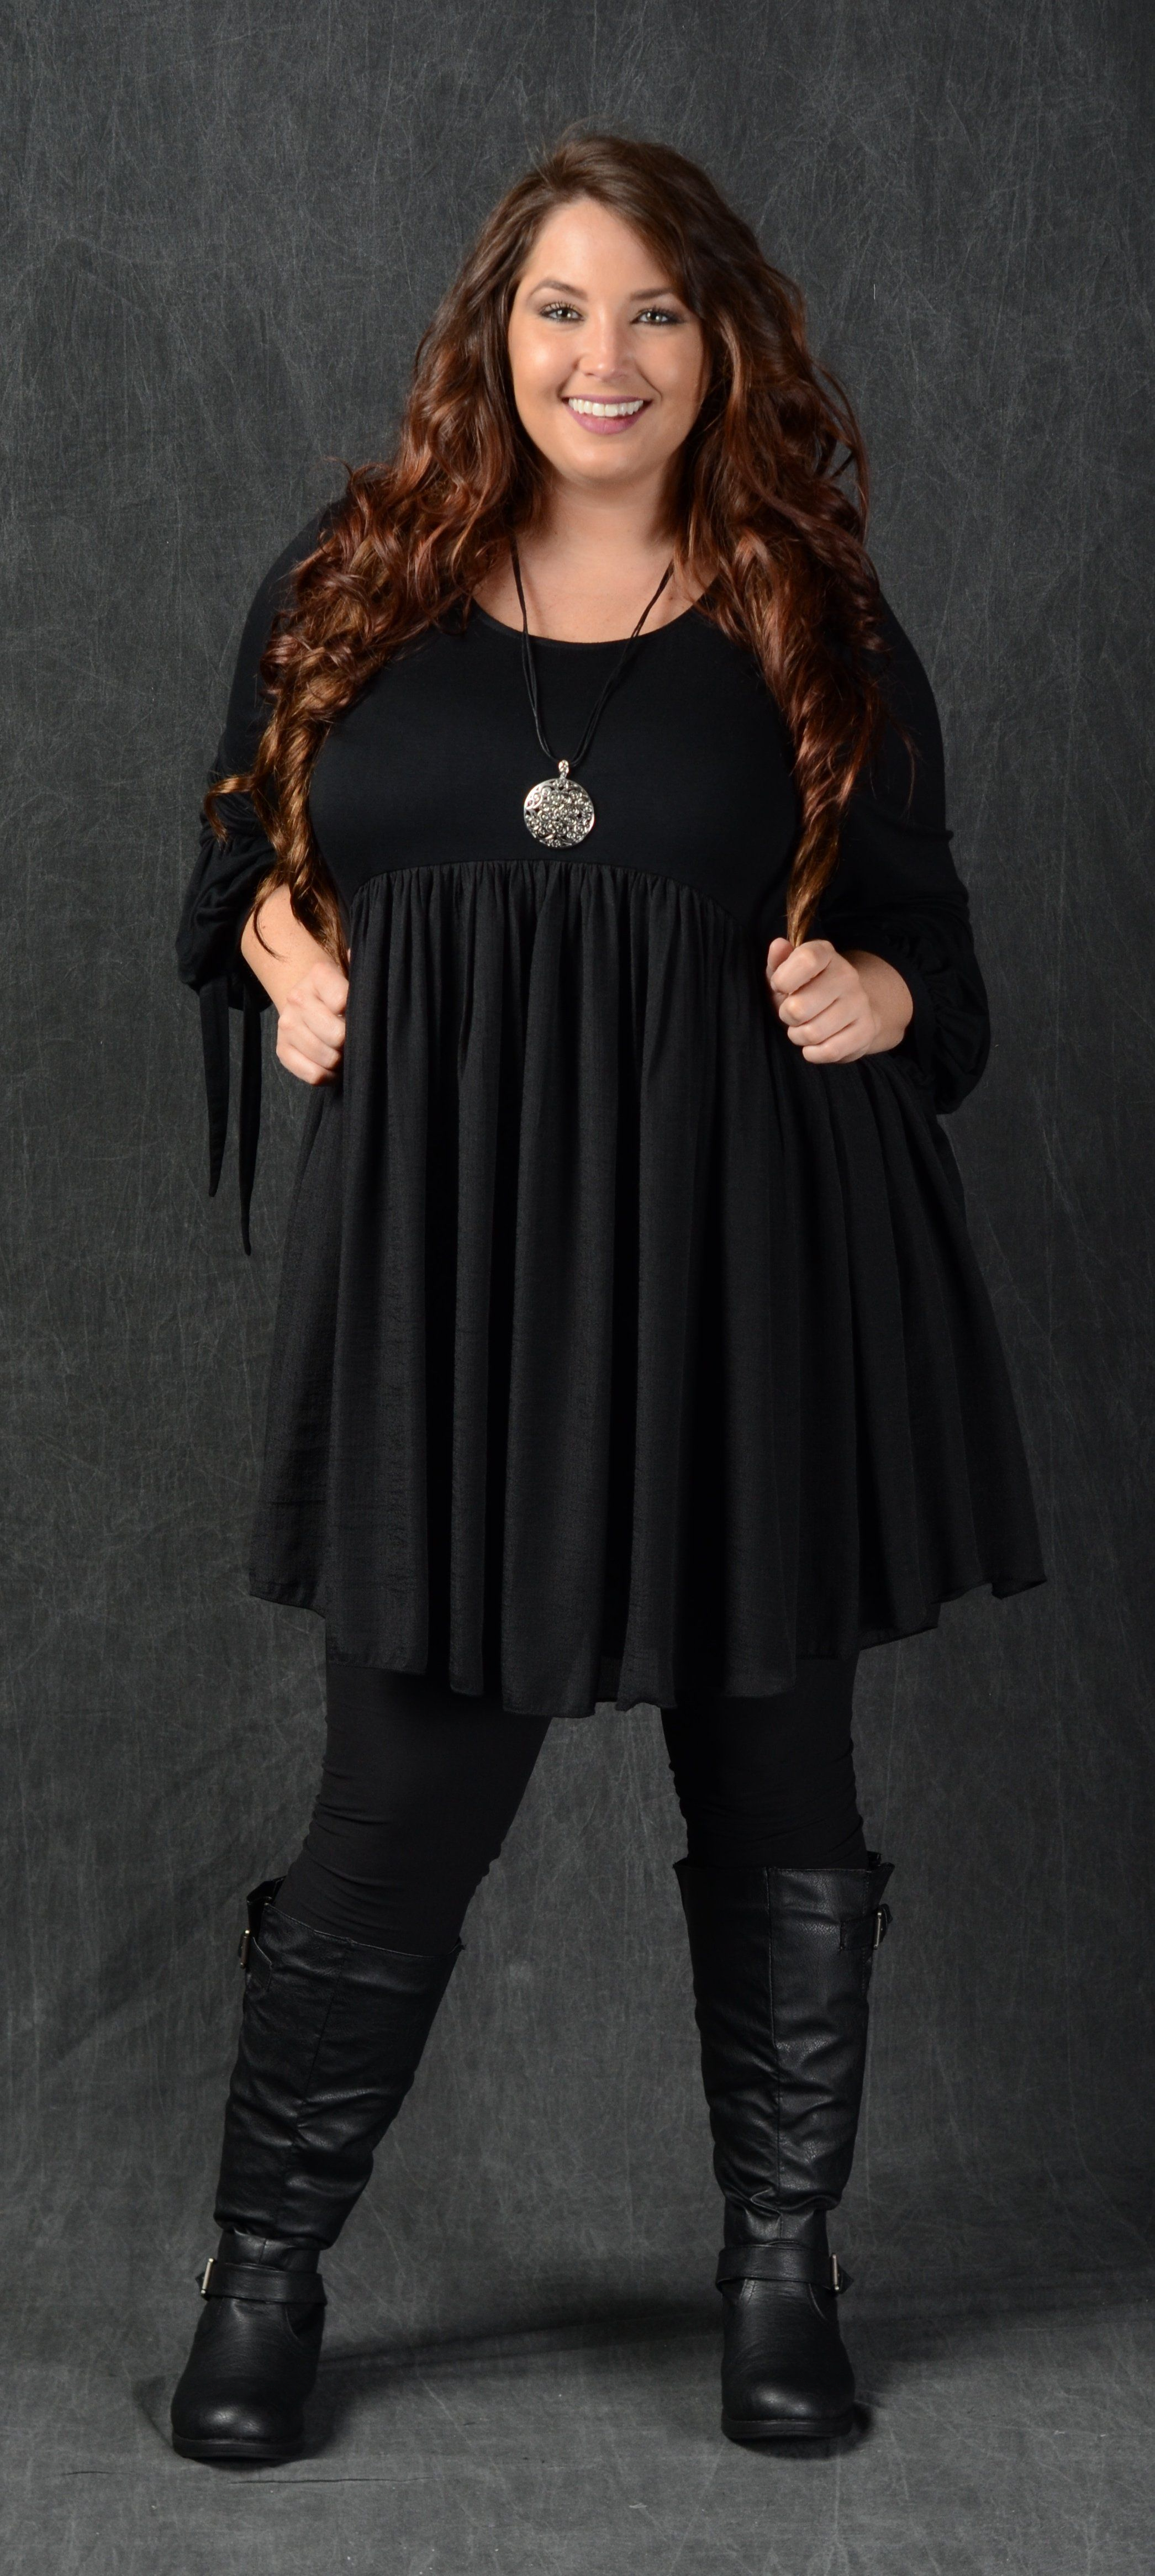 Black Tunic Dress in 2019 | Products | Black tunic dress, Black ...